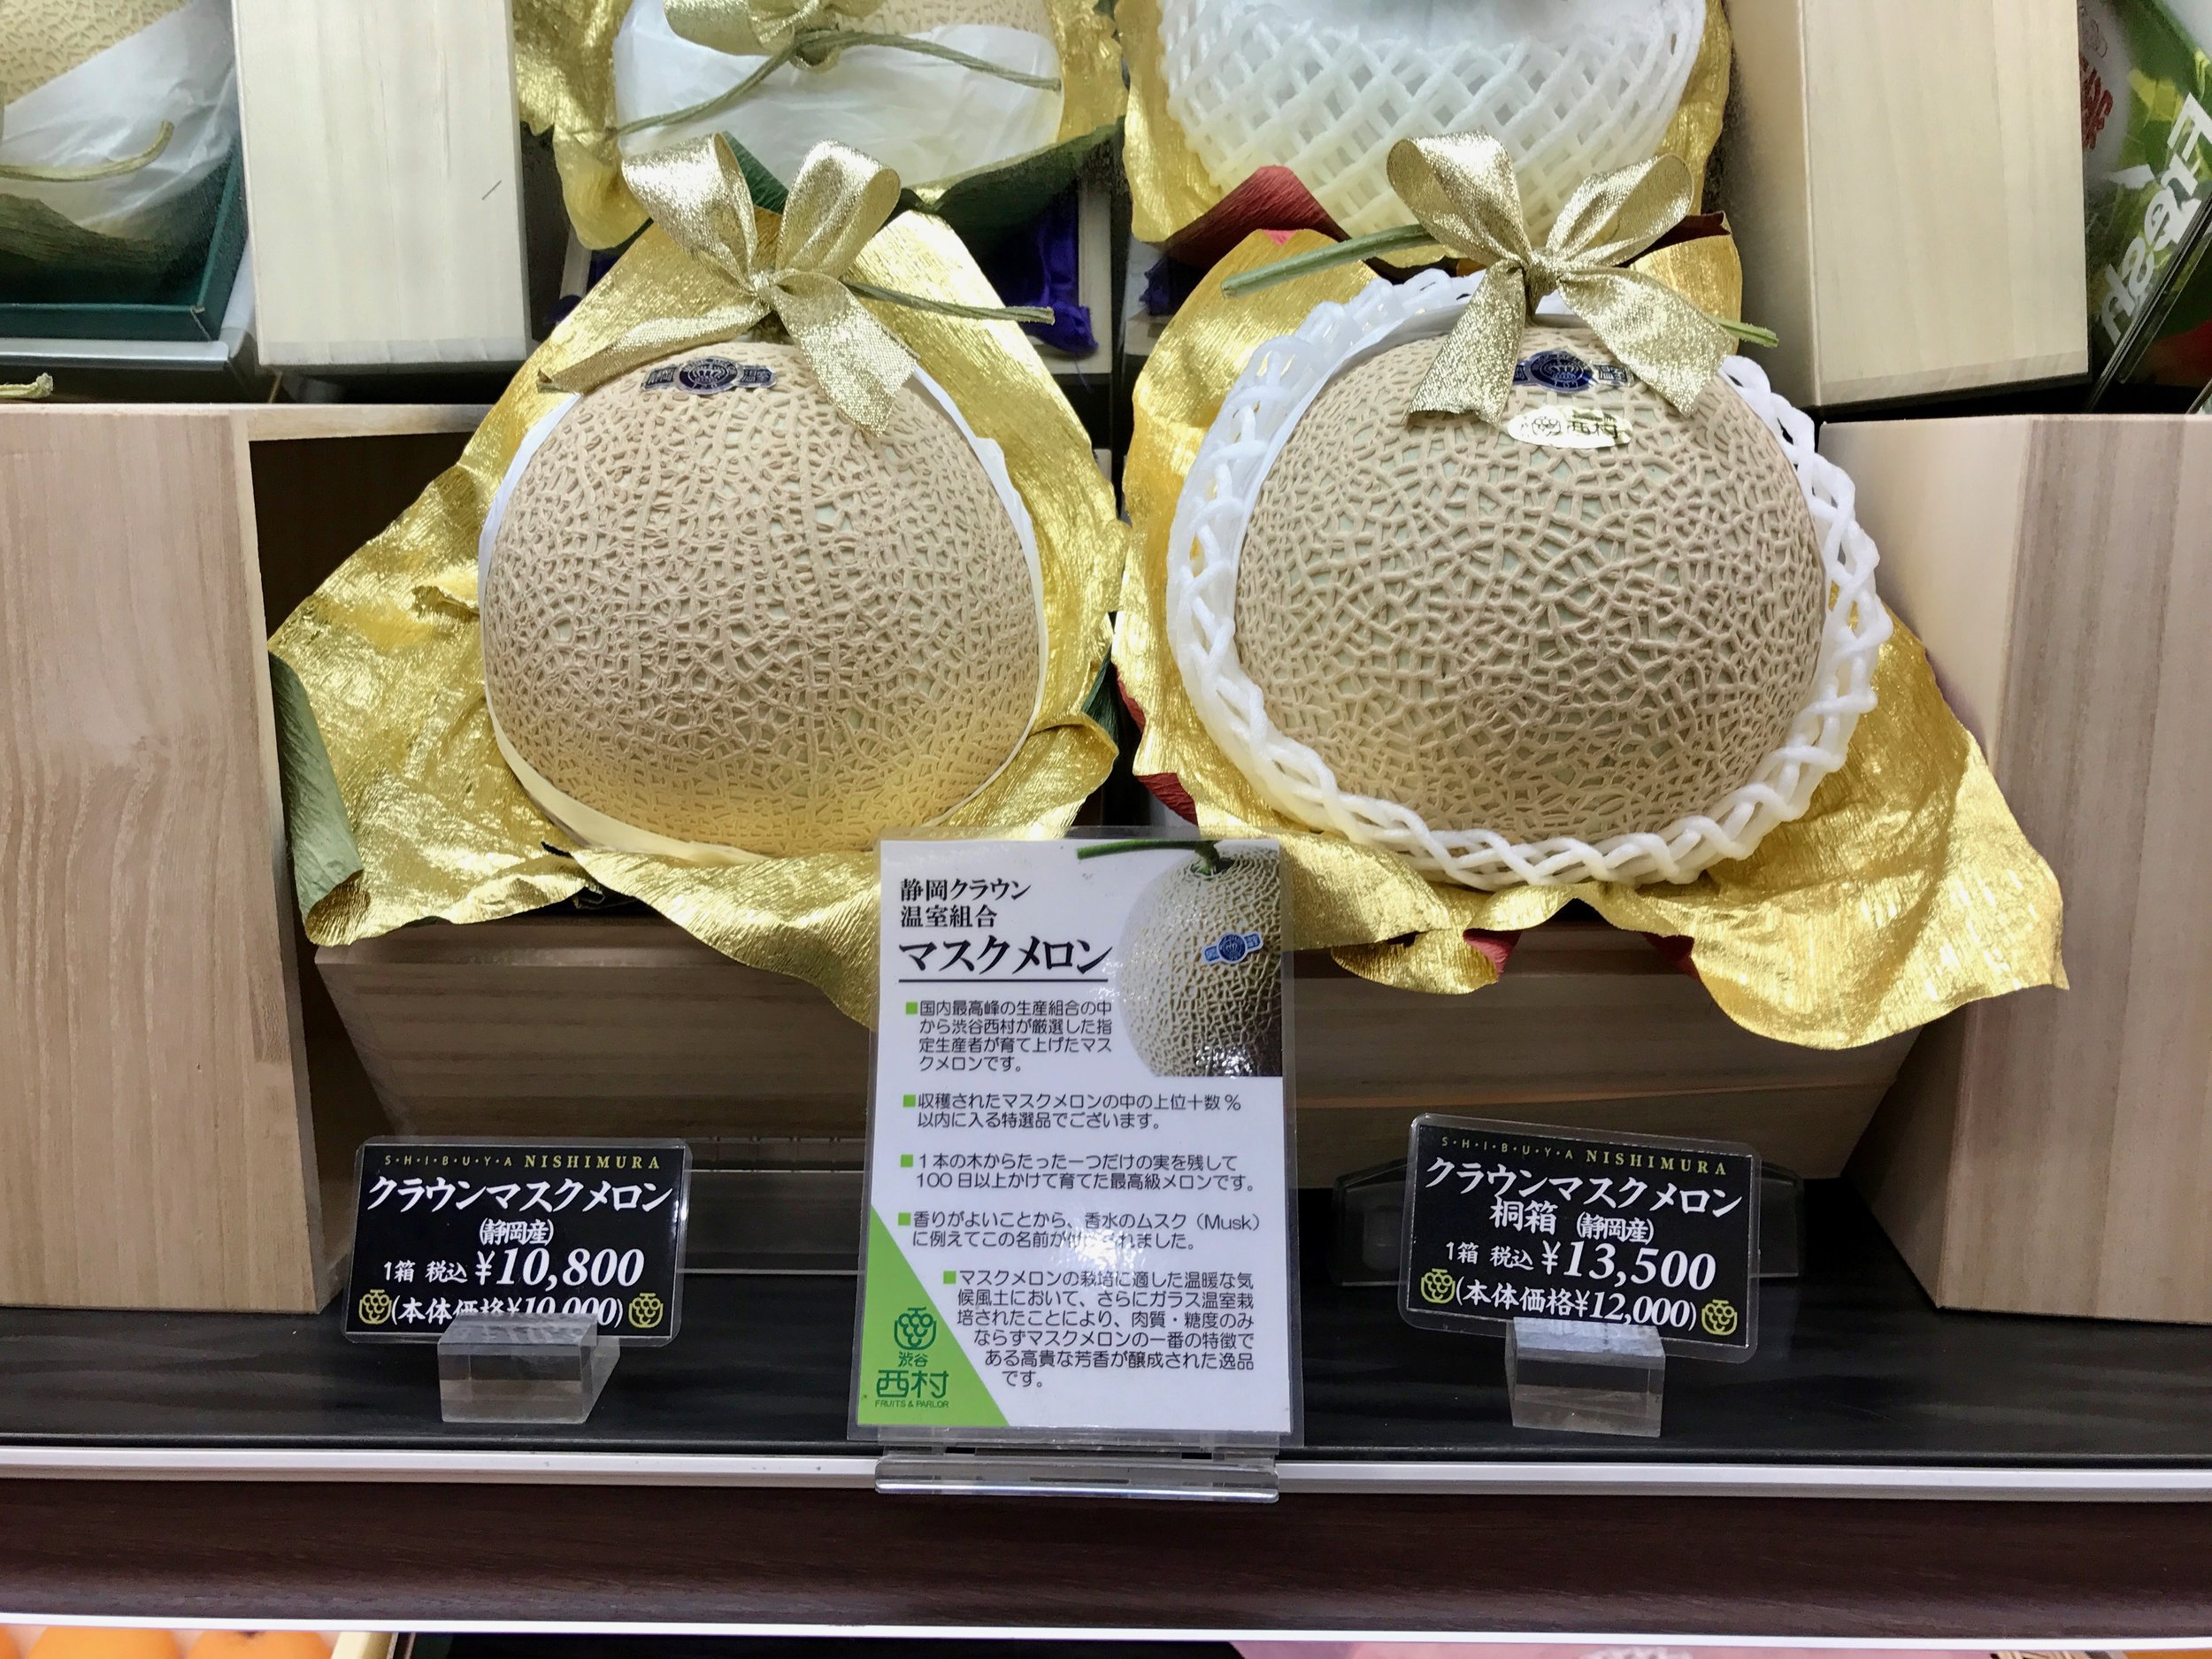 Very expensive cantaloupes..